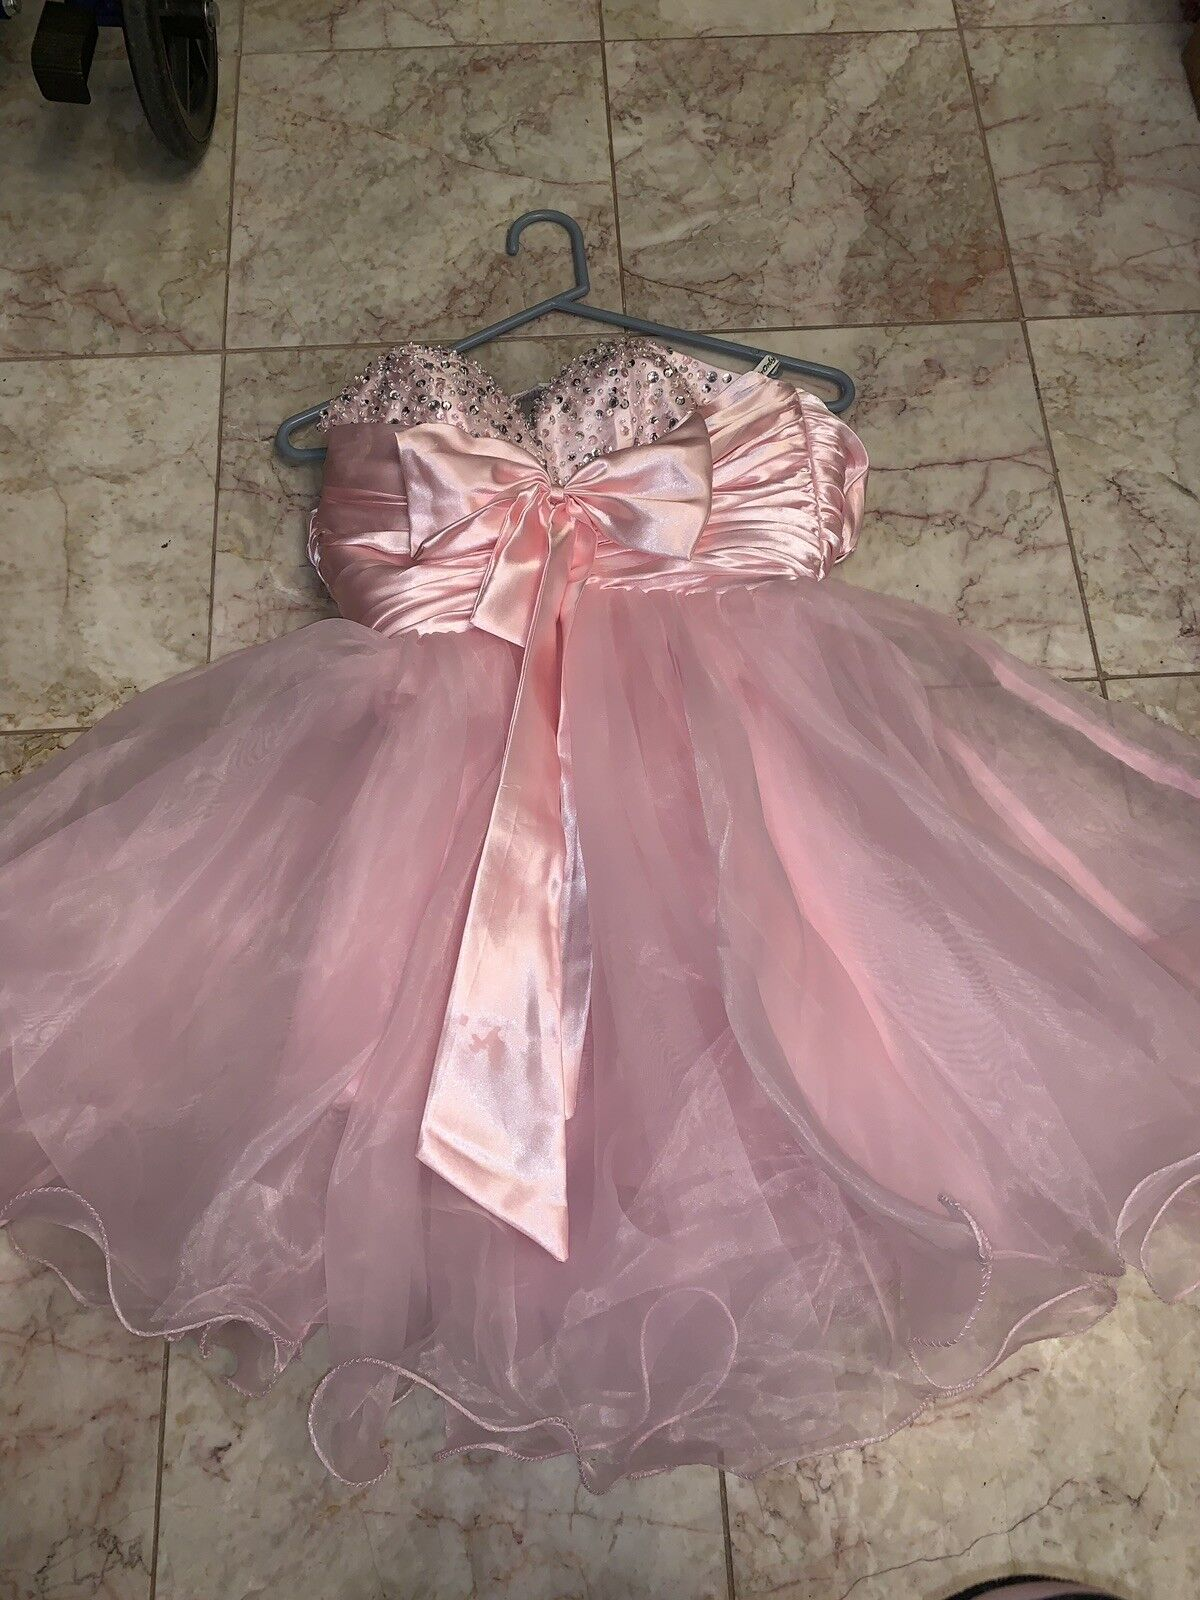 Faironly Fashion Dress Prom Dress Size 8